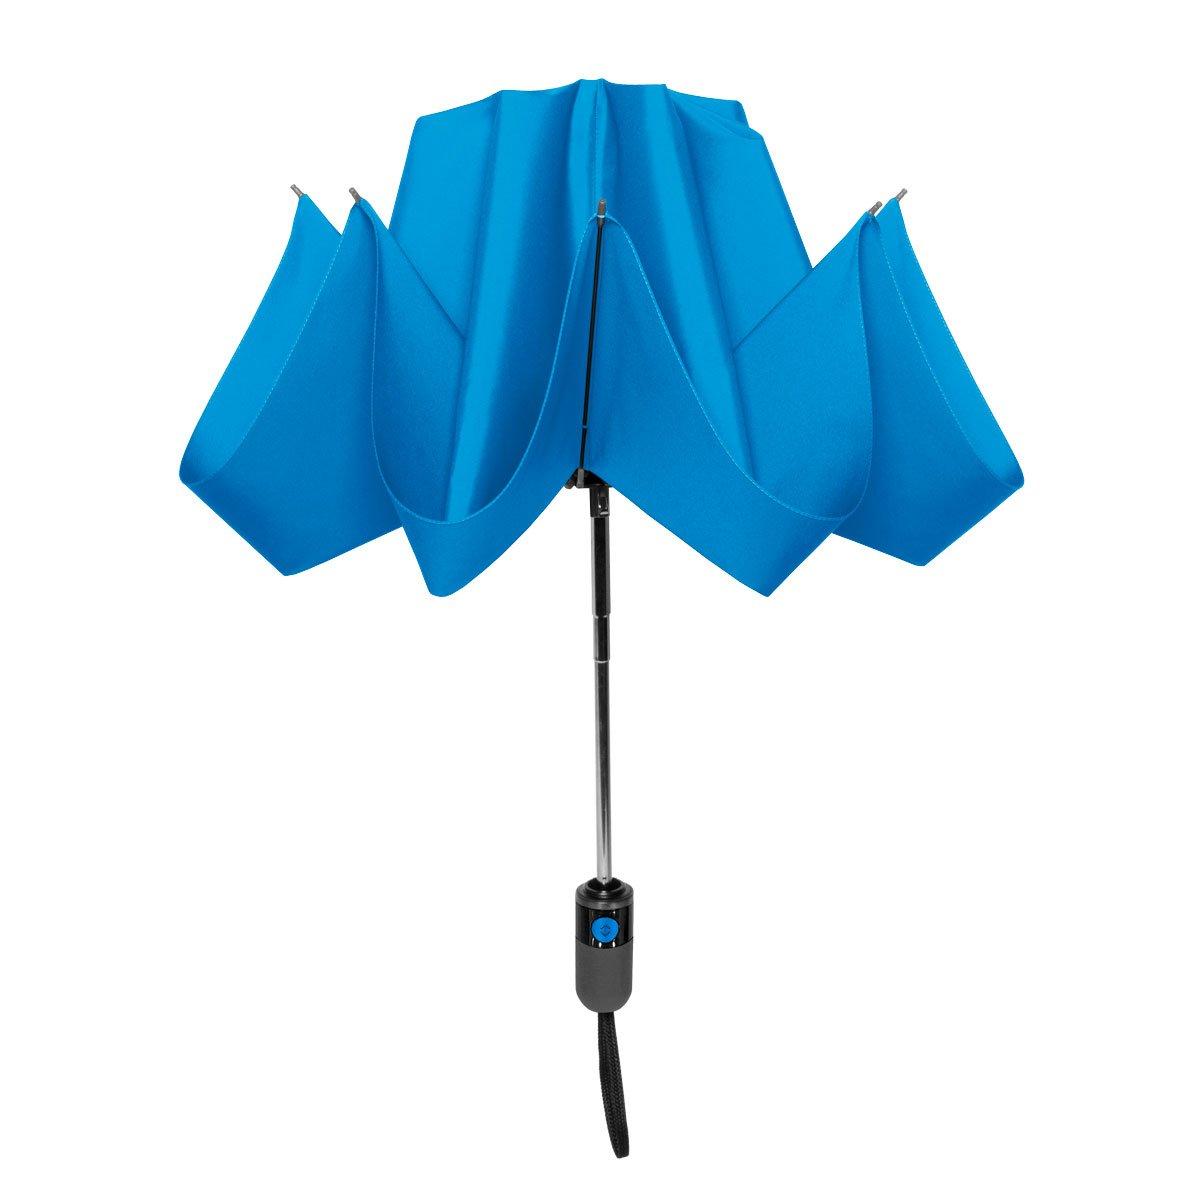 ShedRain UnbelievaBrella Compact Reverse Umbrella: Ocean Blue